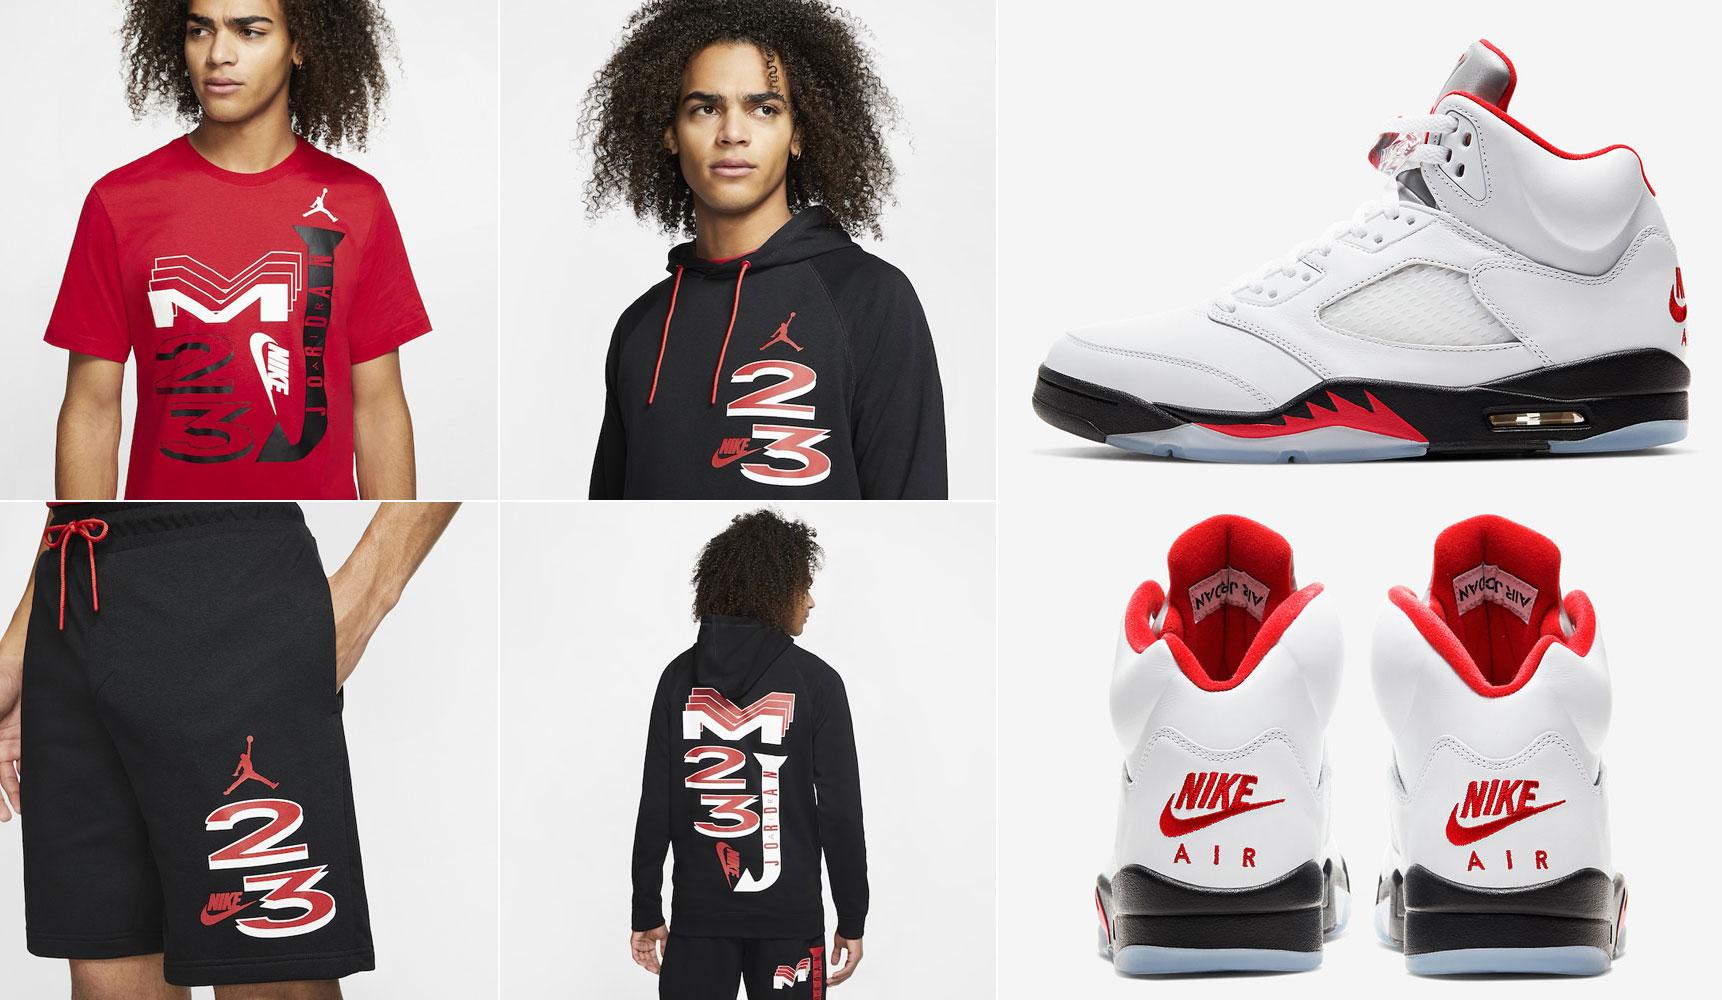 air-jordan-5-fire-red-matching-clothes